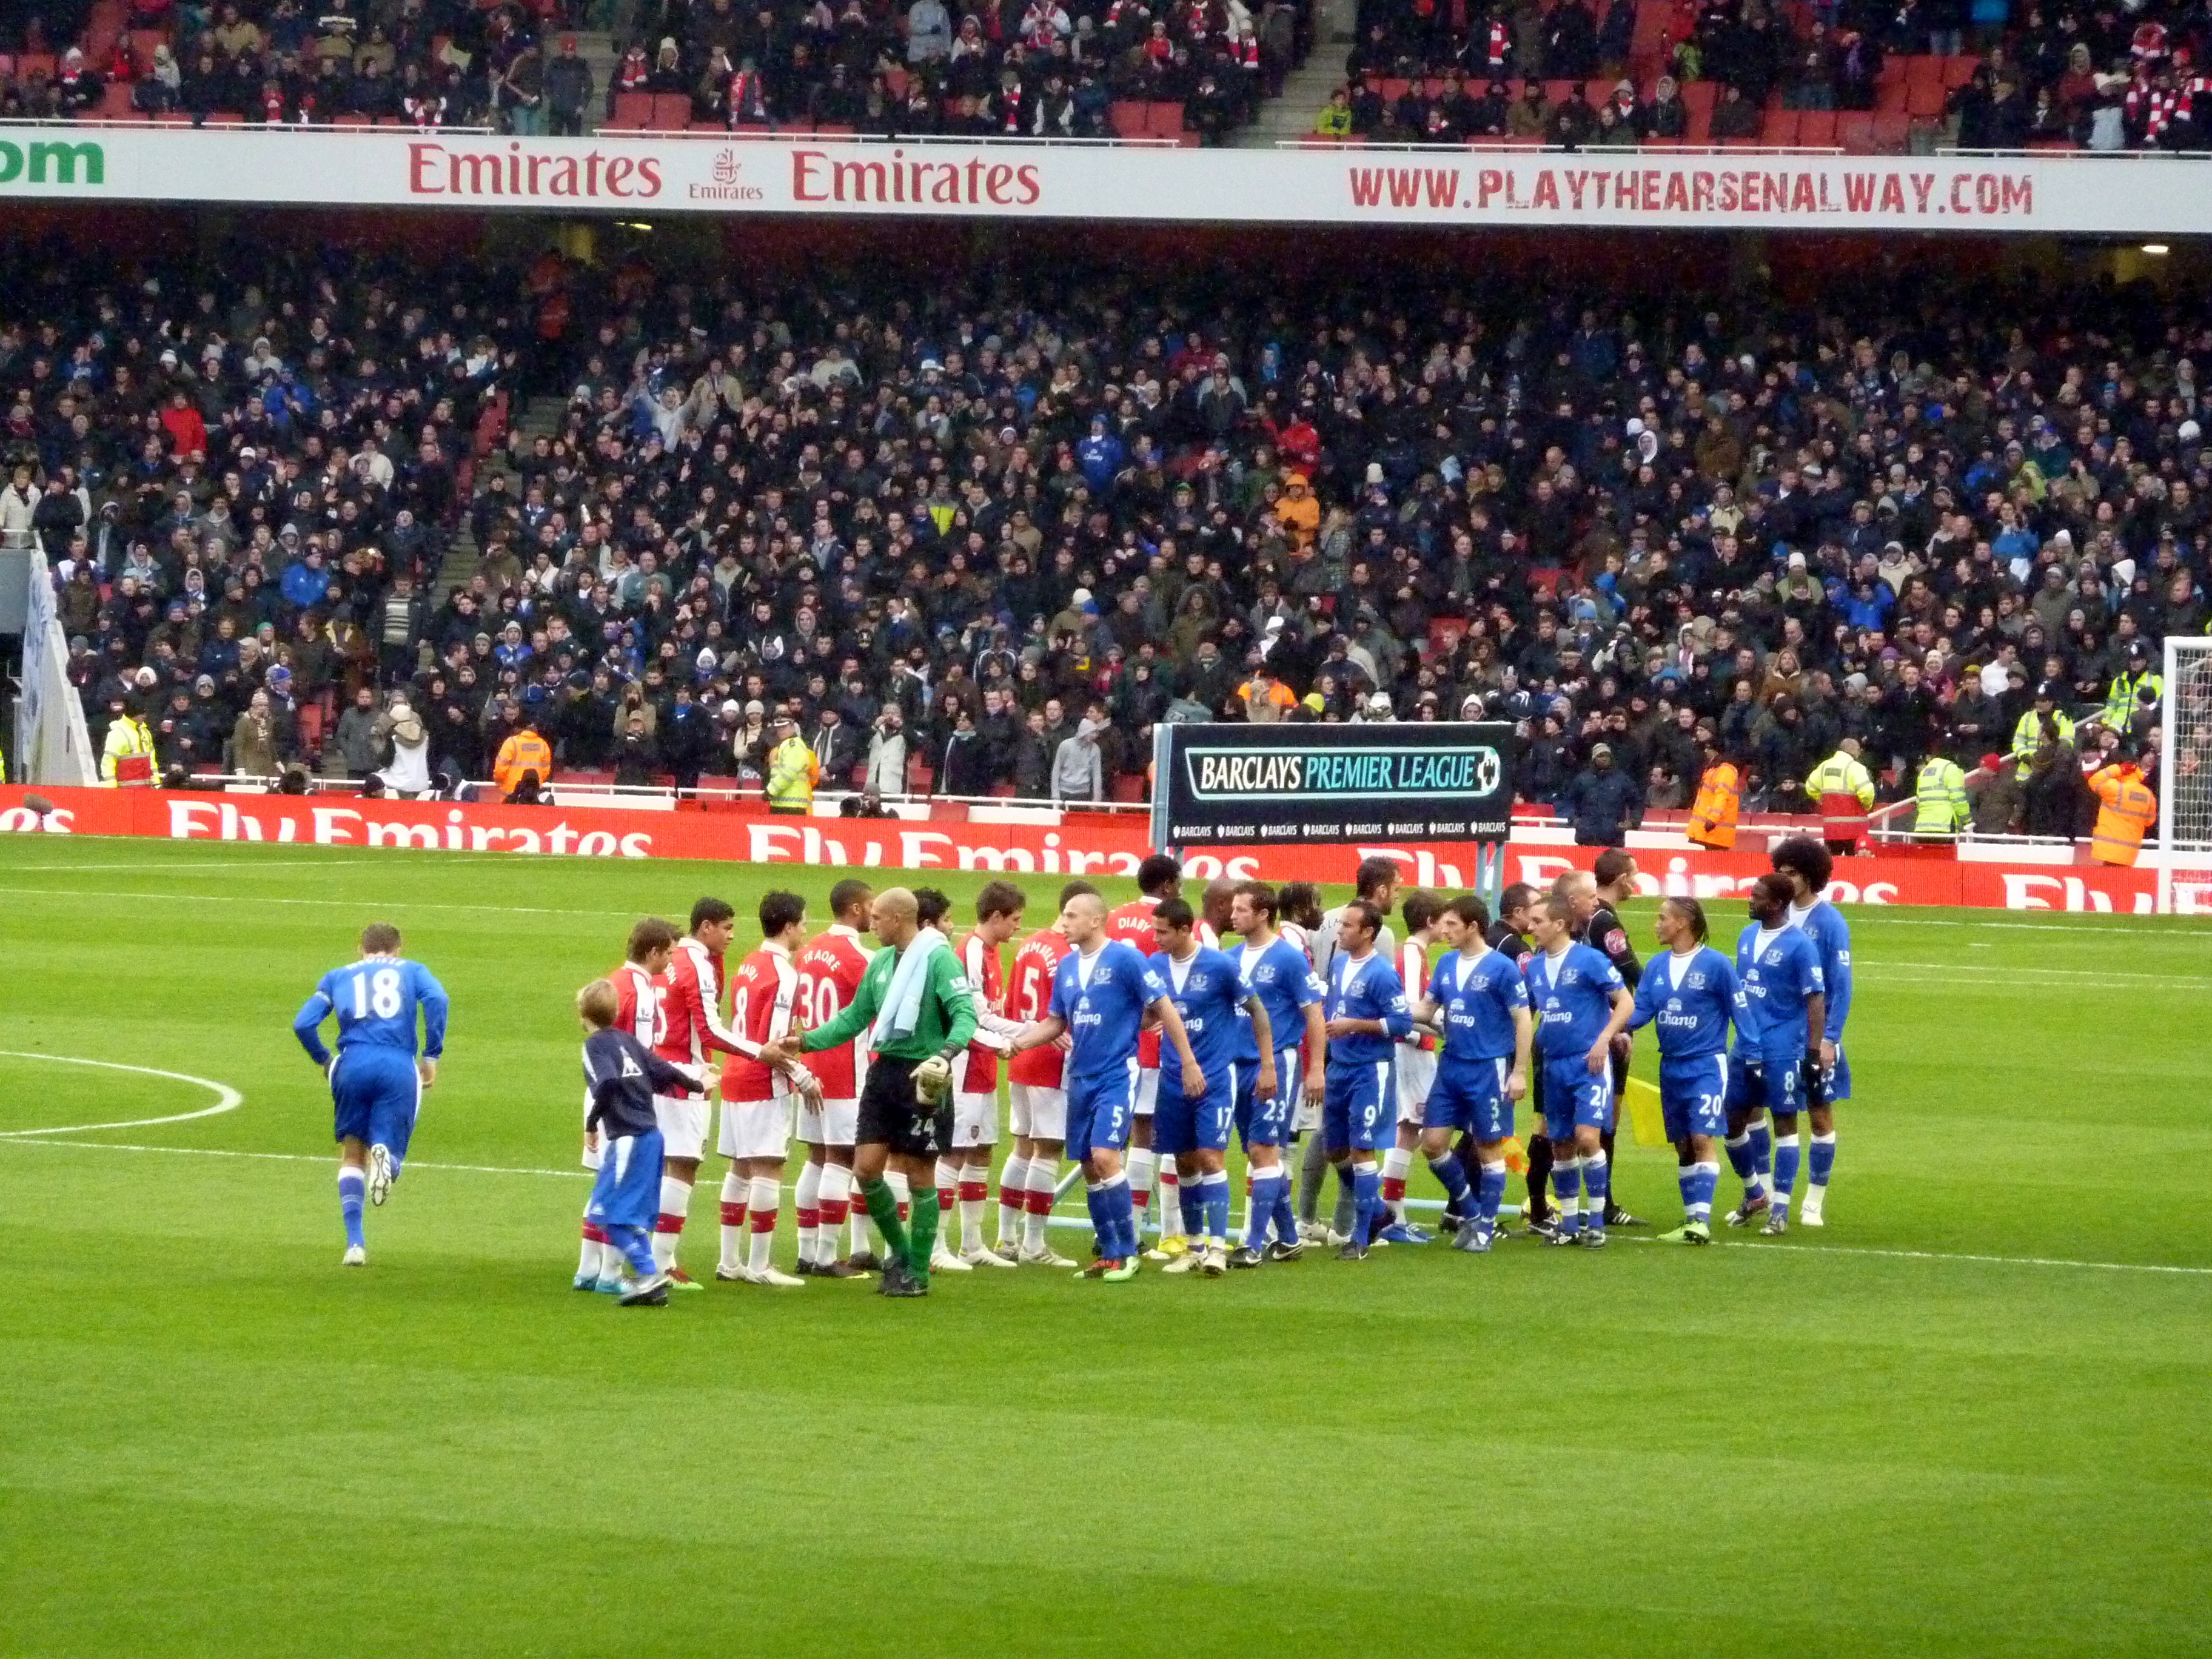 Image Result For Arsenal Vs Everton